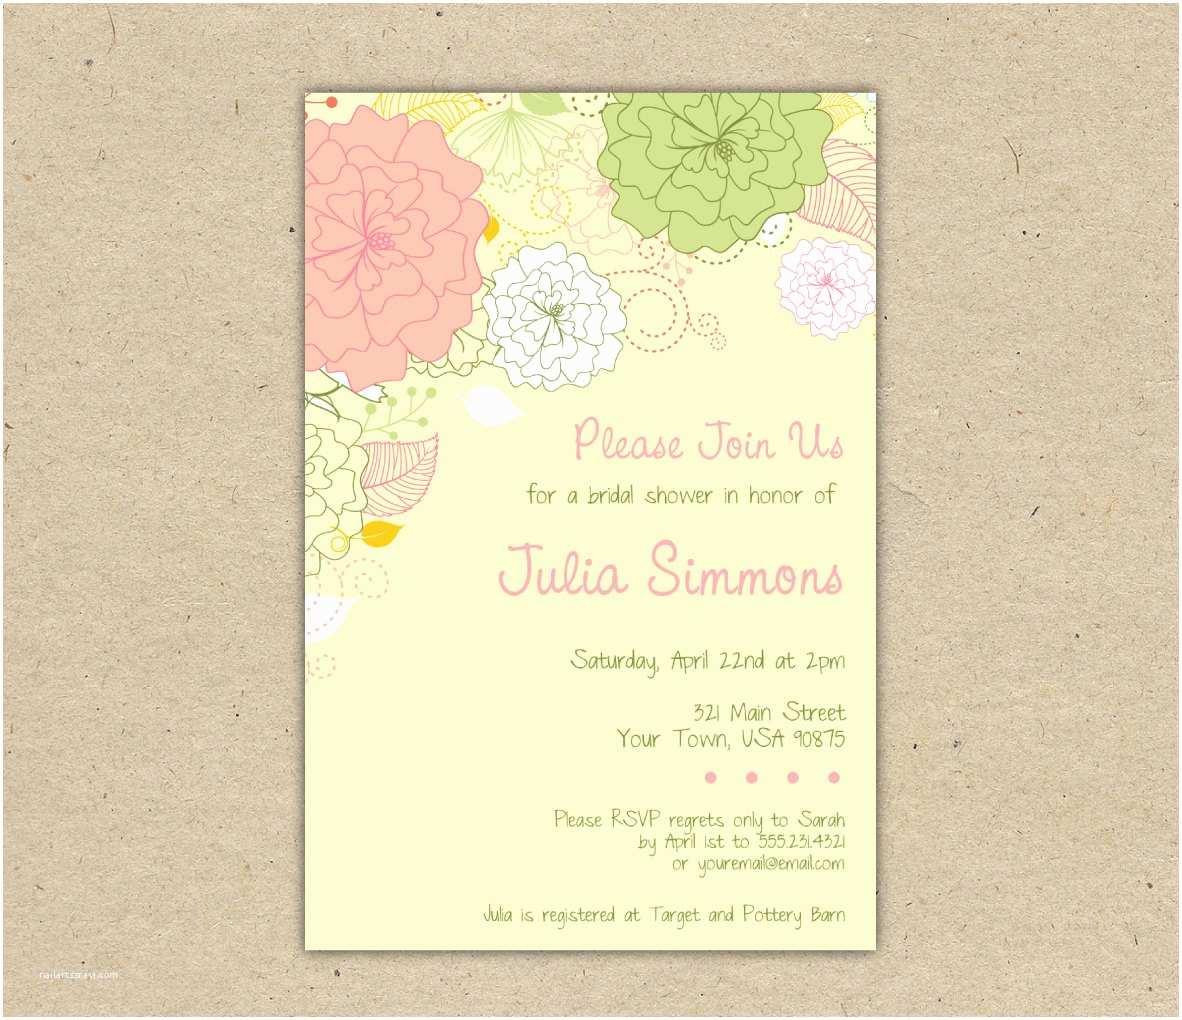 Printable Wedding Shower Invitations Printable Wedding Shower Invitations Template